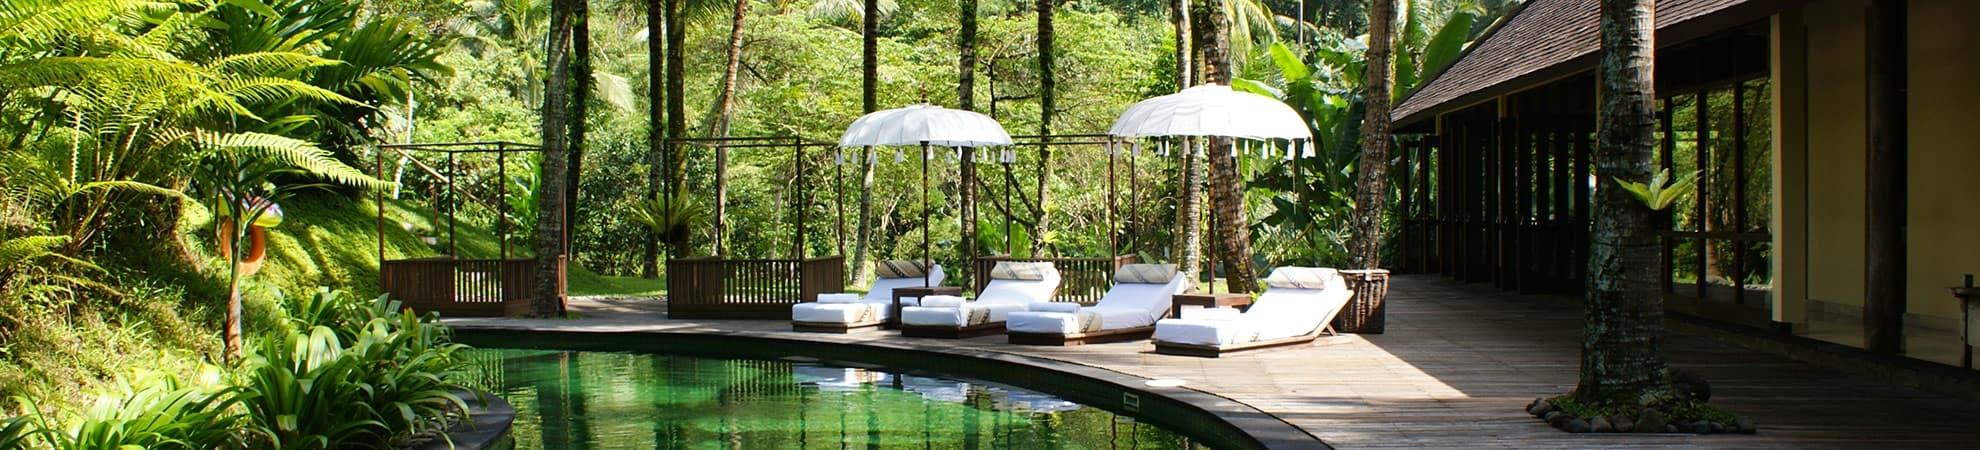 Hôtels Bali 5 étoiles luxe